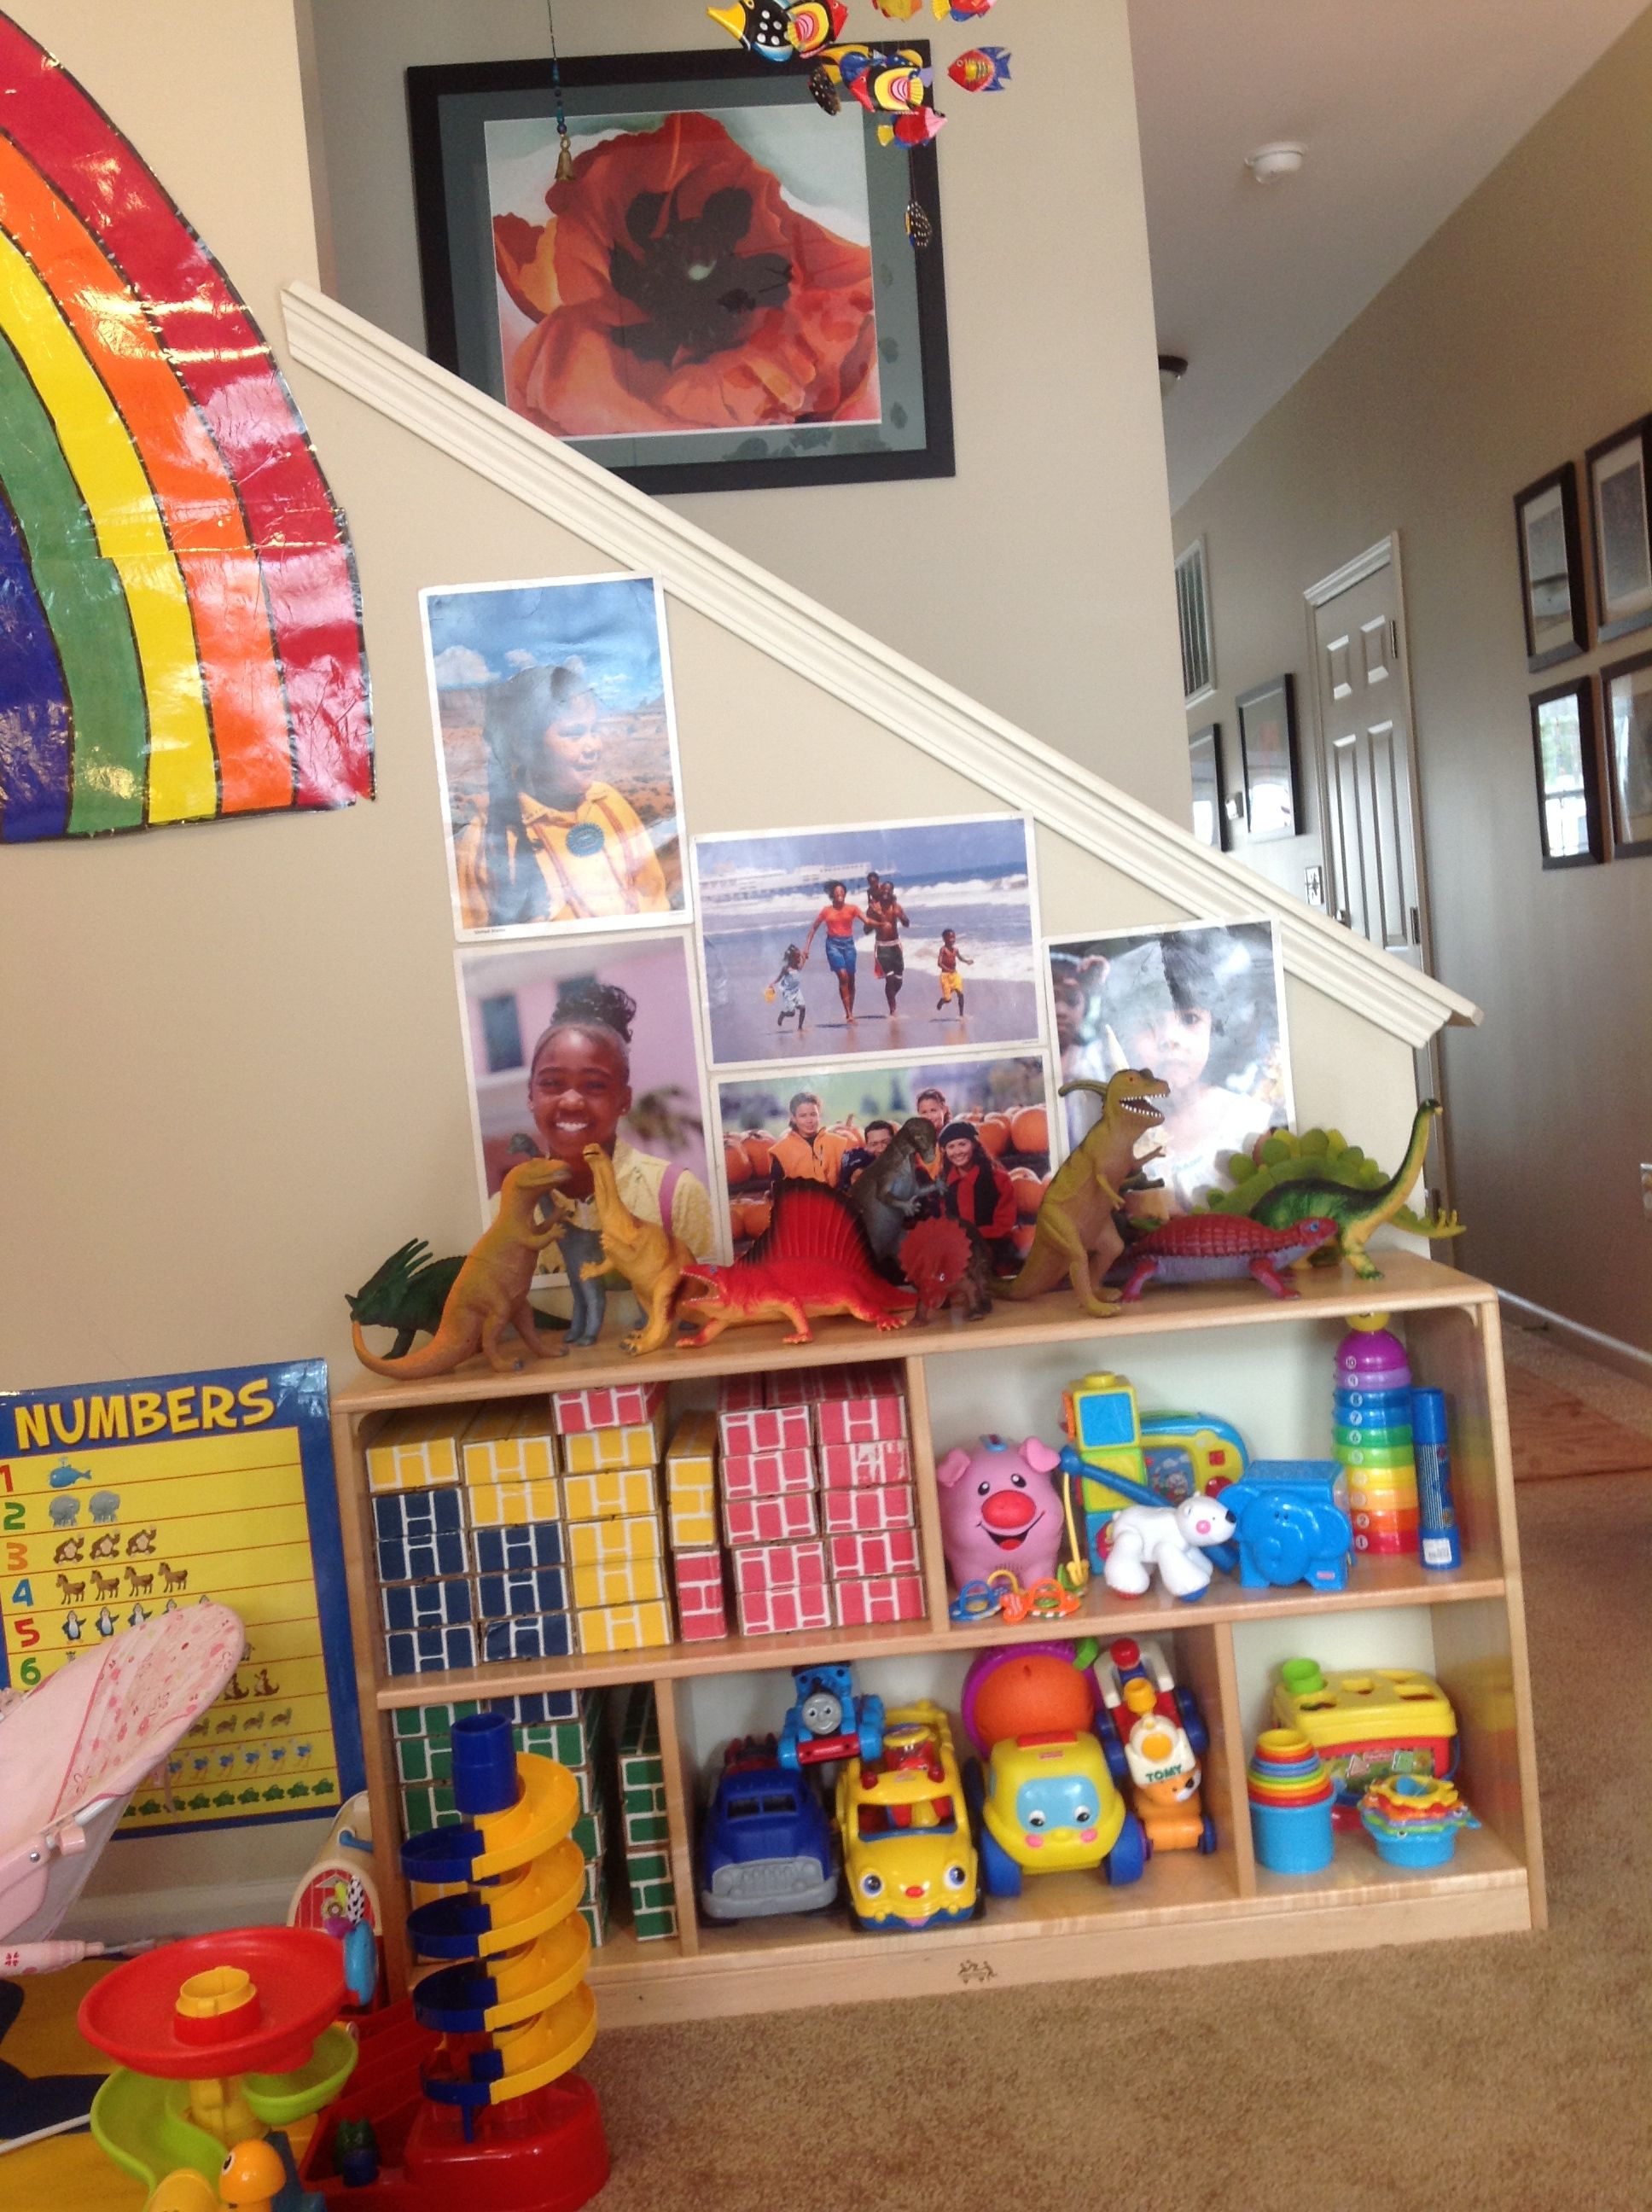 Small Space Setup Home Childcare Home Childcare Home Daycare Daycare Setup